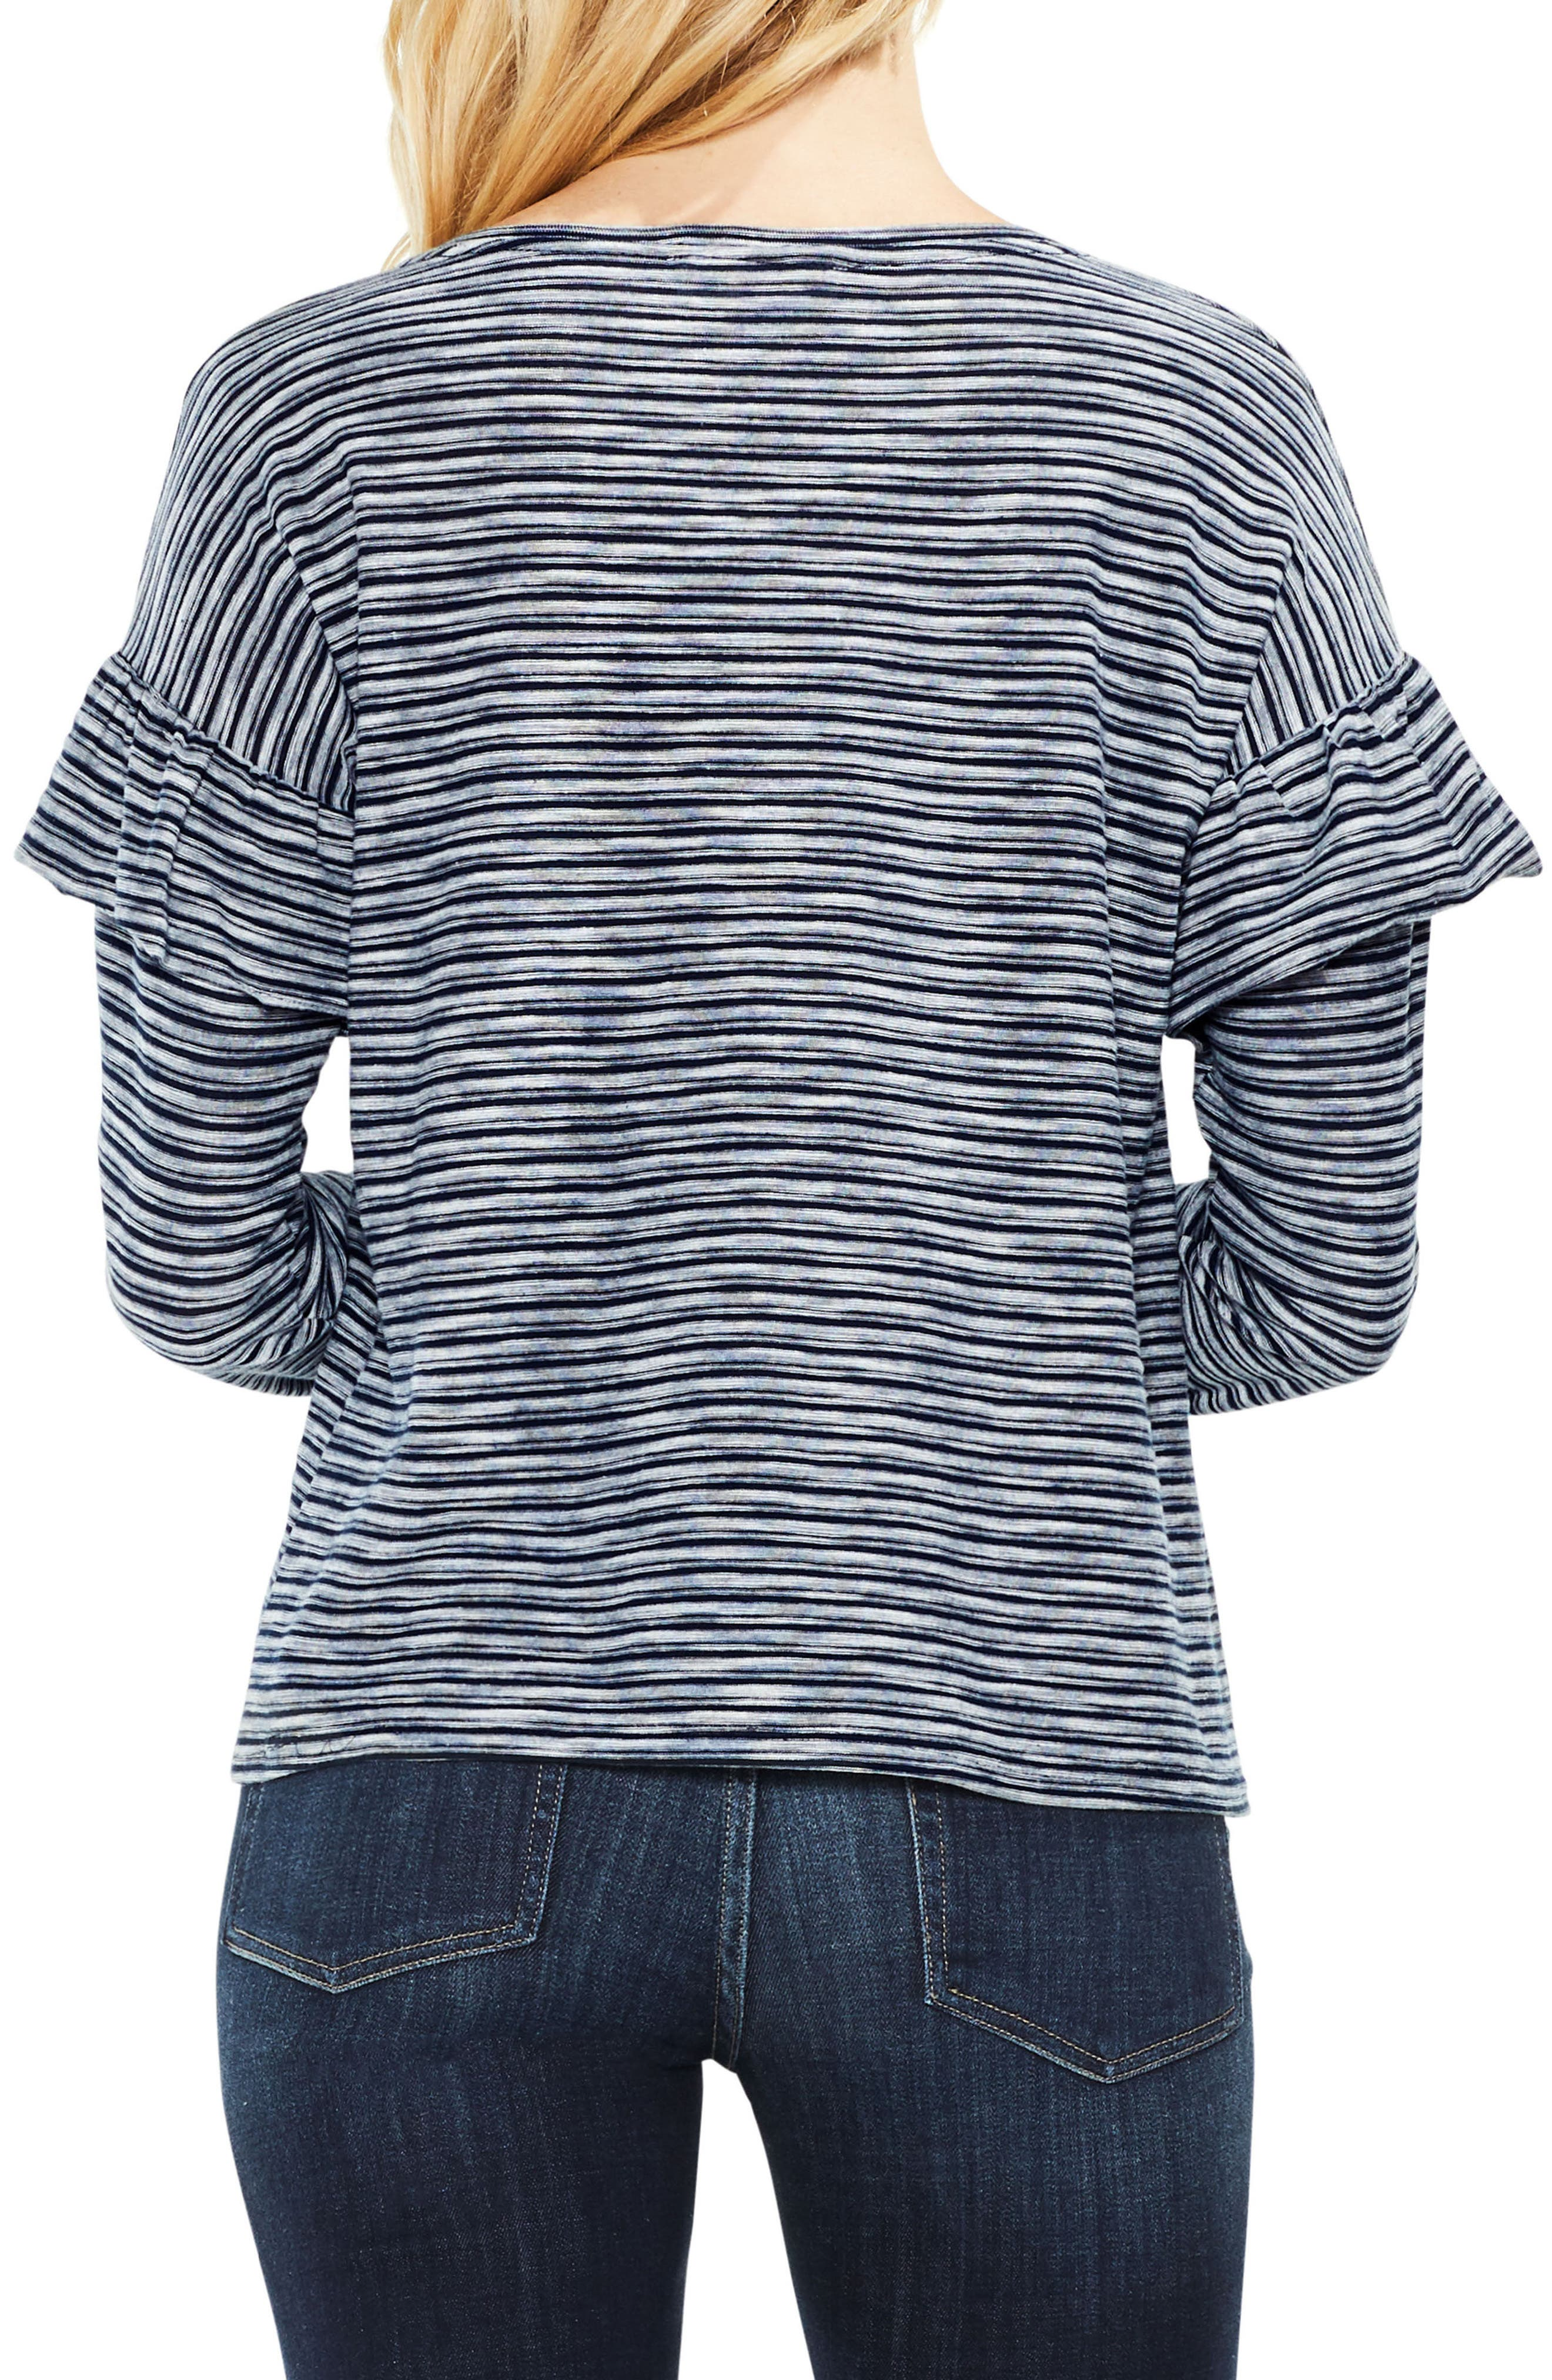 Long Sleeve Ruffle Shoulder Top,                             Alternate thumbnail 2, color,                             461